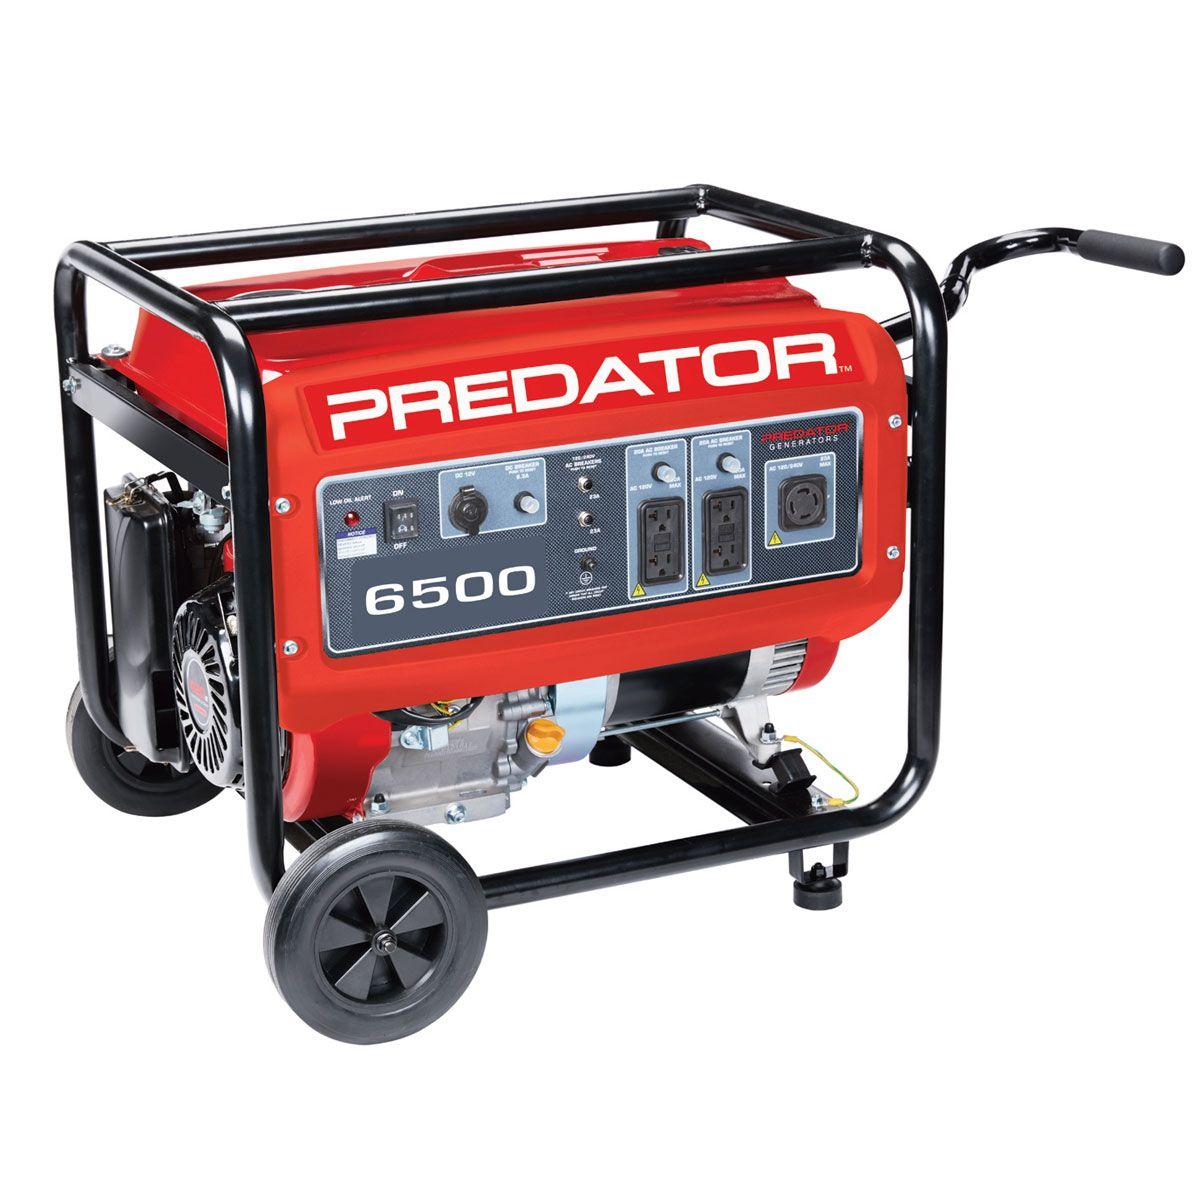 420cc, 6500 Watts Max/5500 Watts Rated Portable Generator